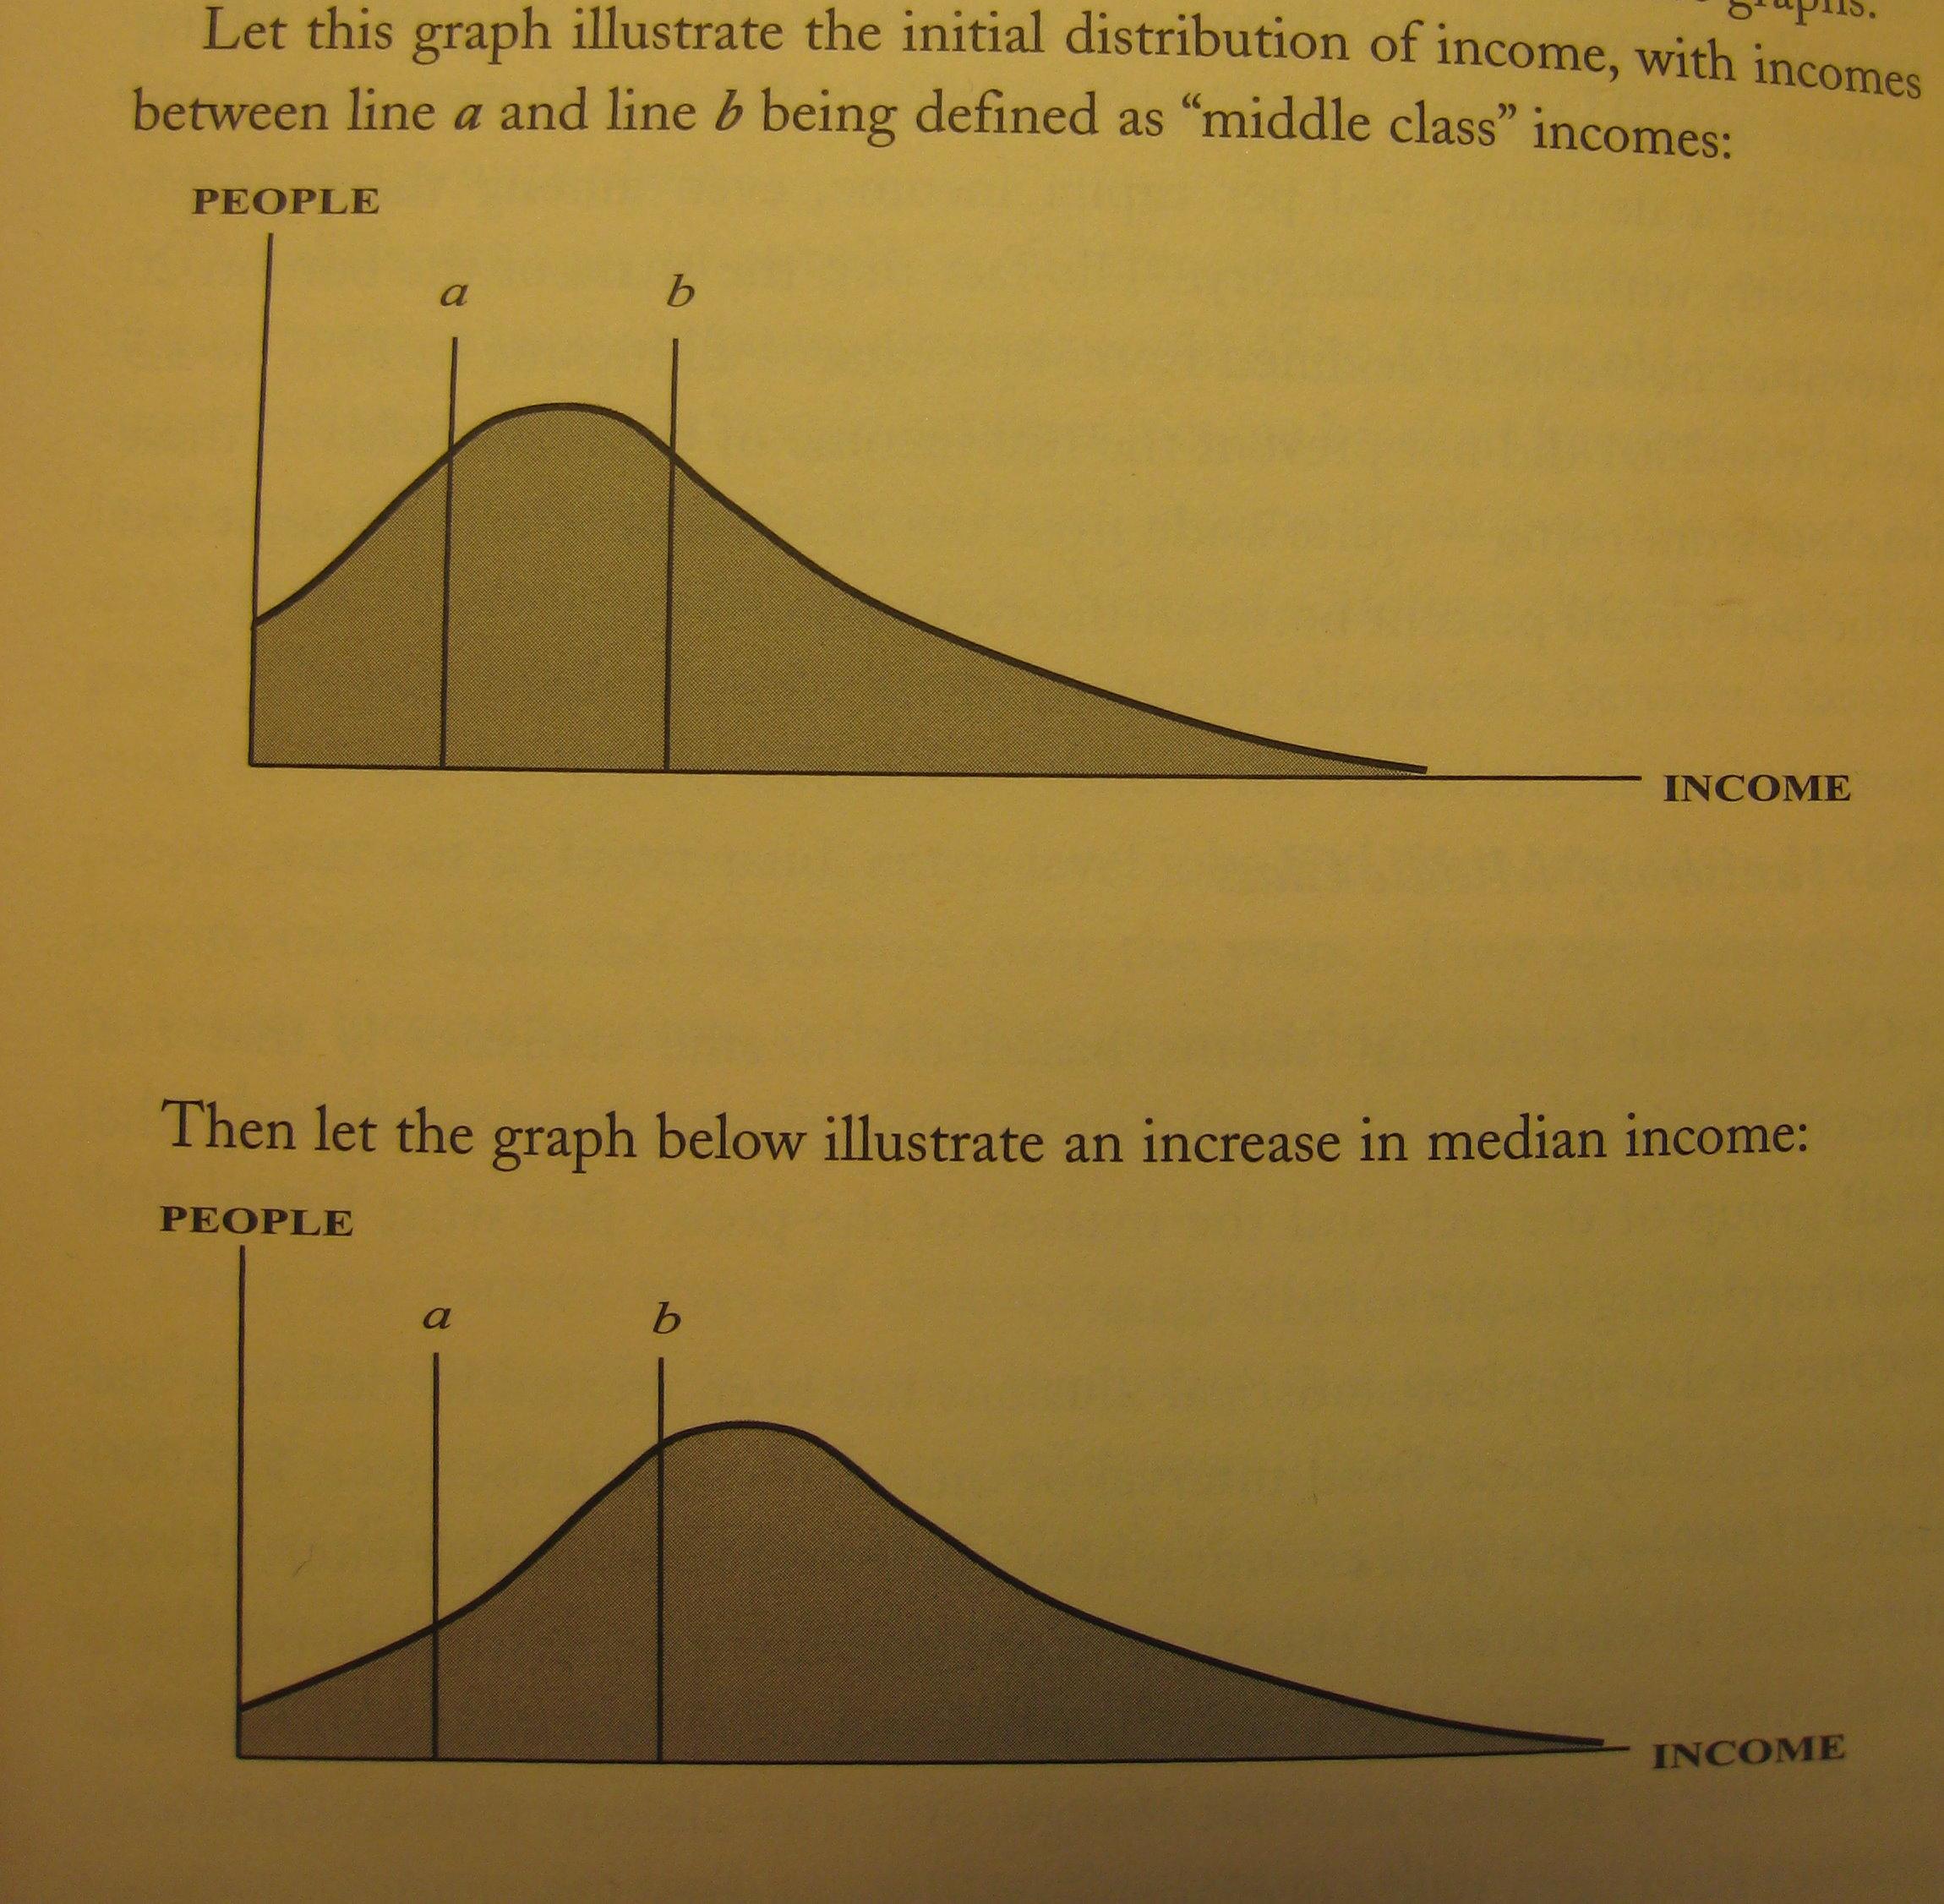 income-distribution-median-3-income-us